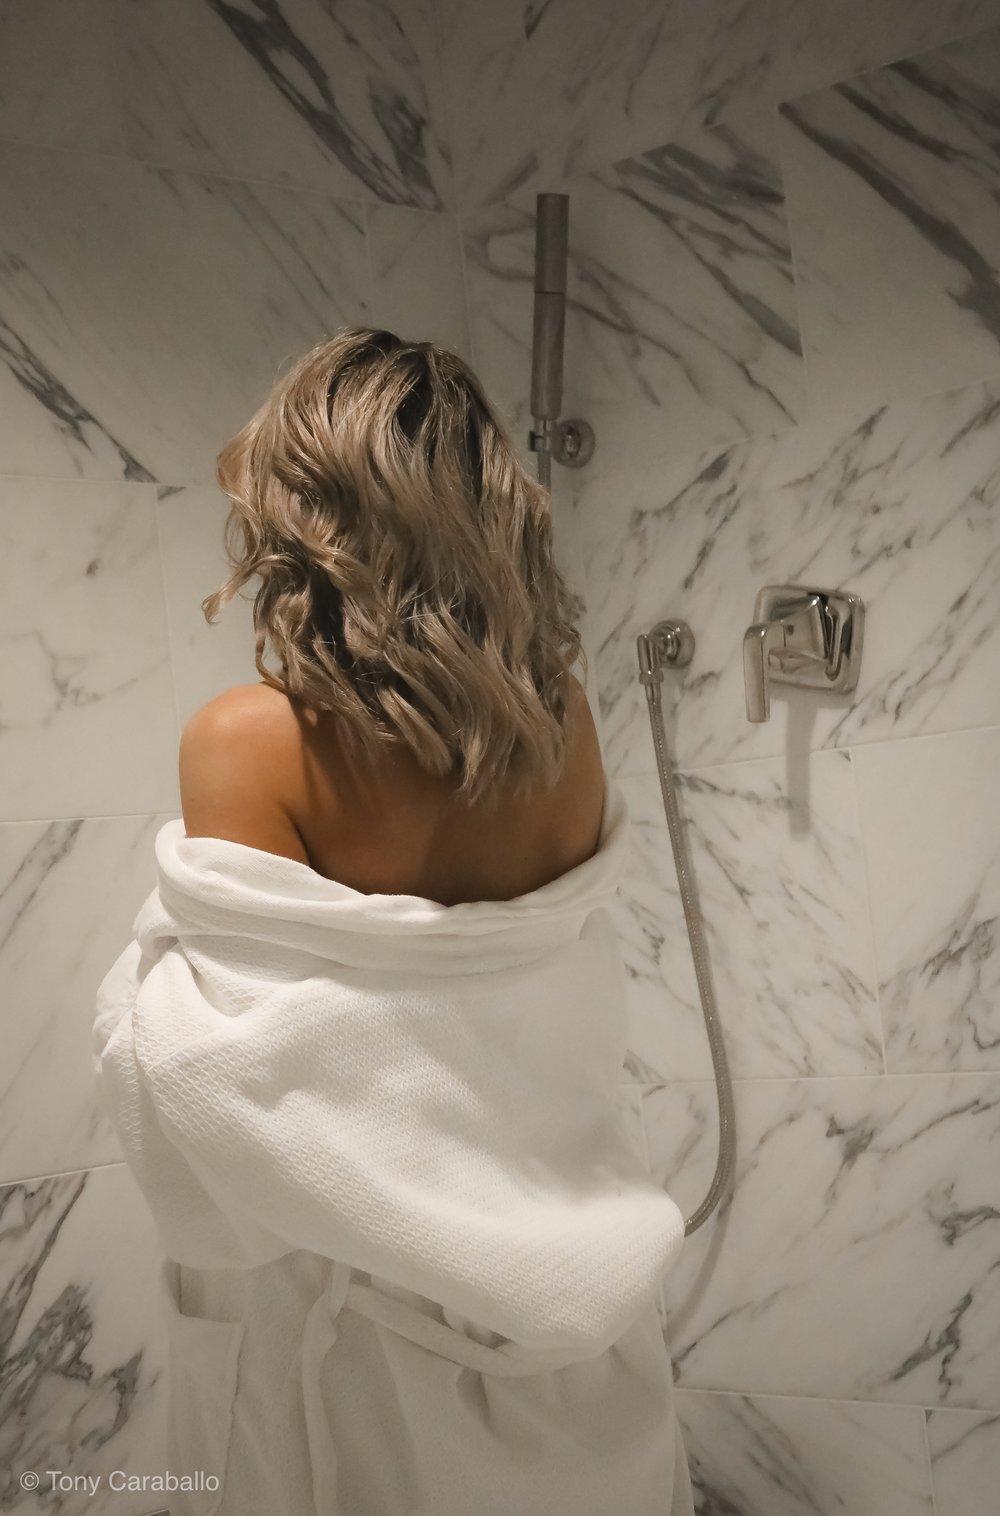 Ritz Carlton Presidential Suite Isabel Alexander showering